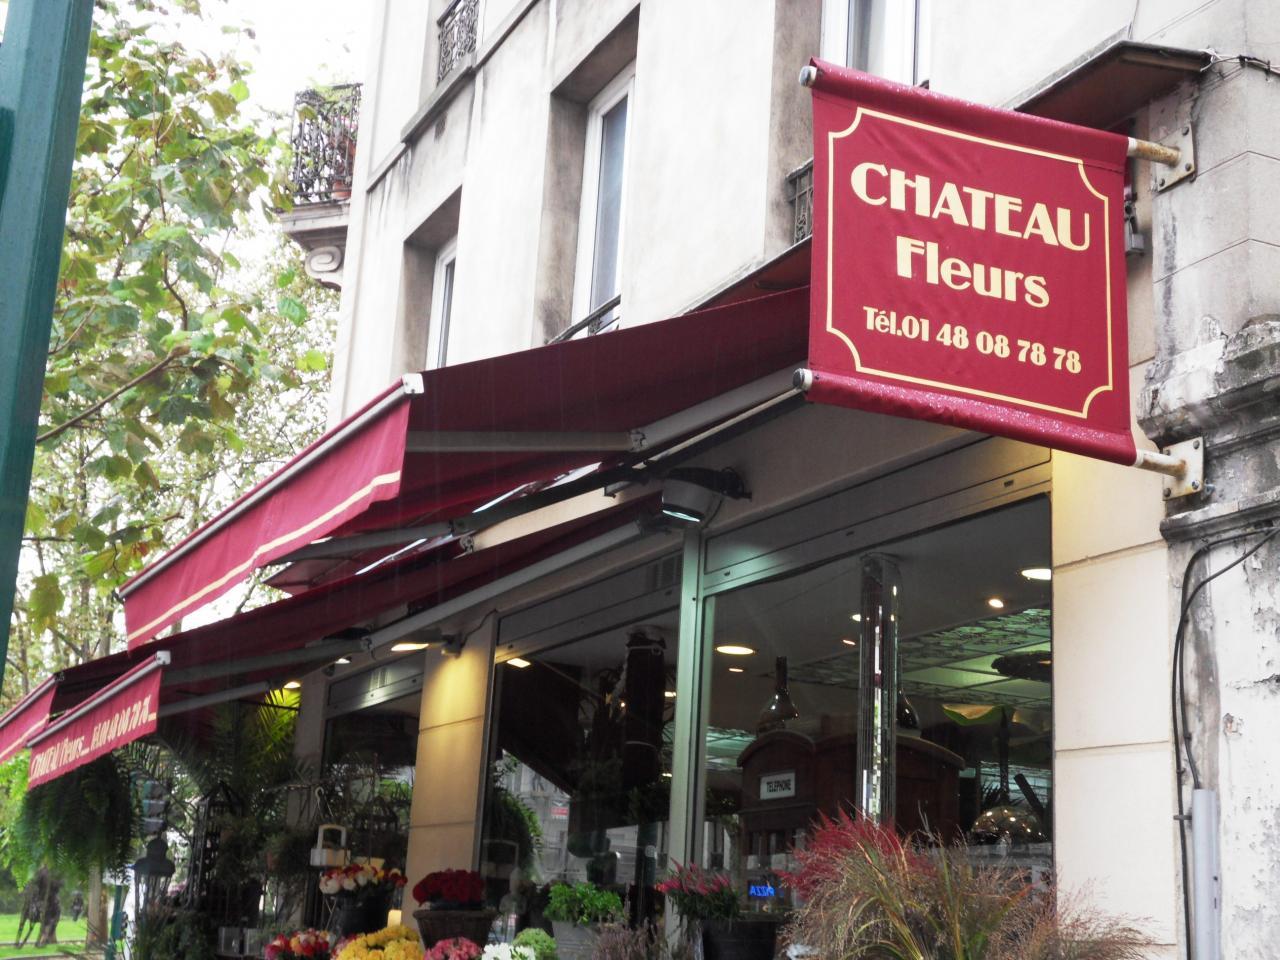 CHATEAU FLEUR